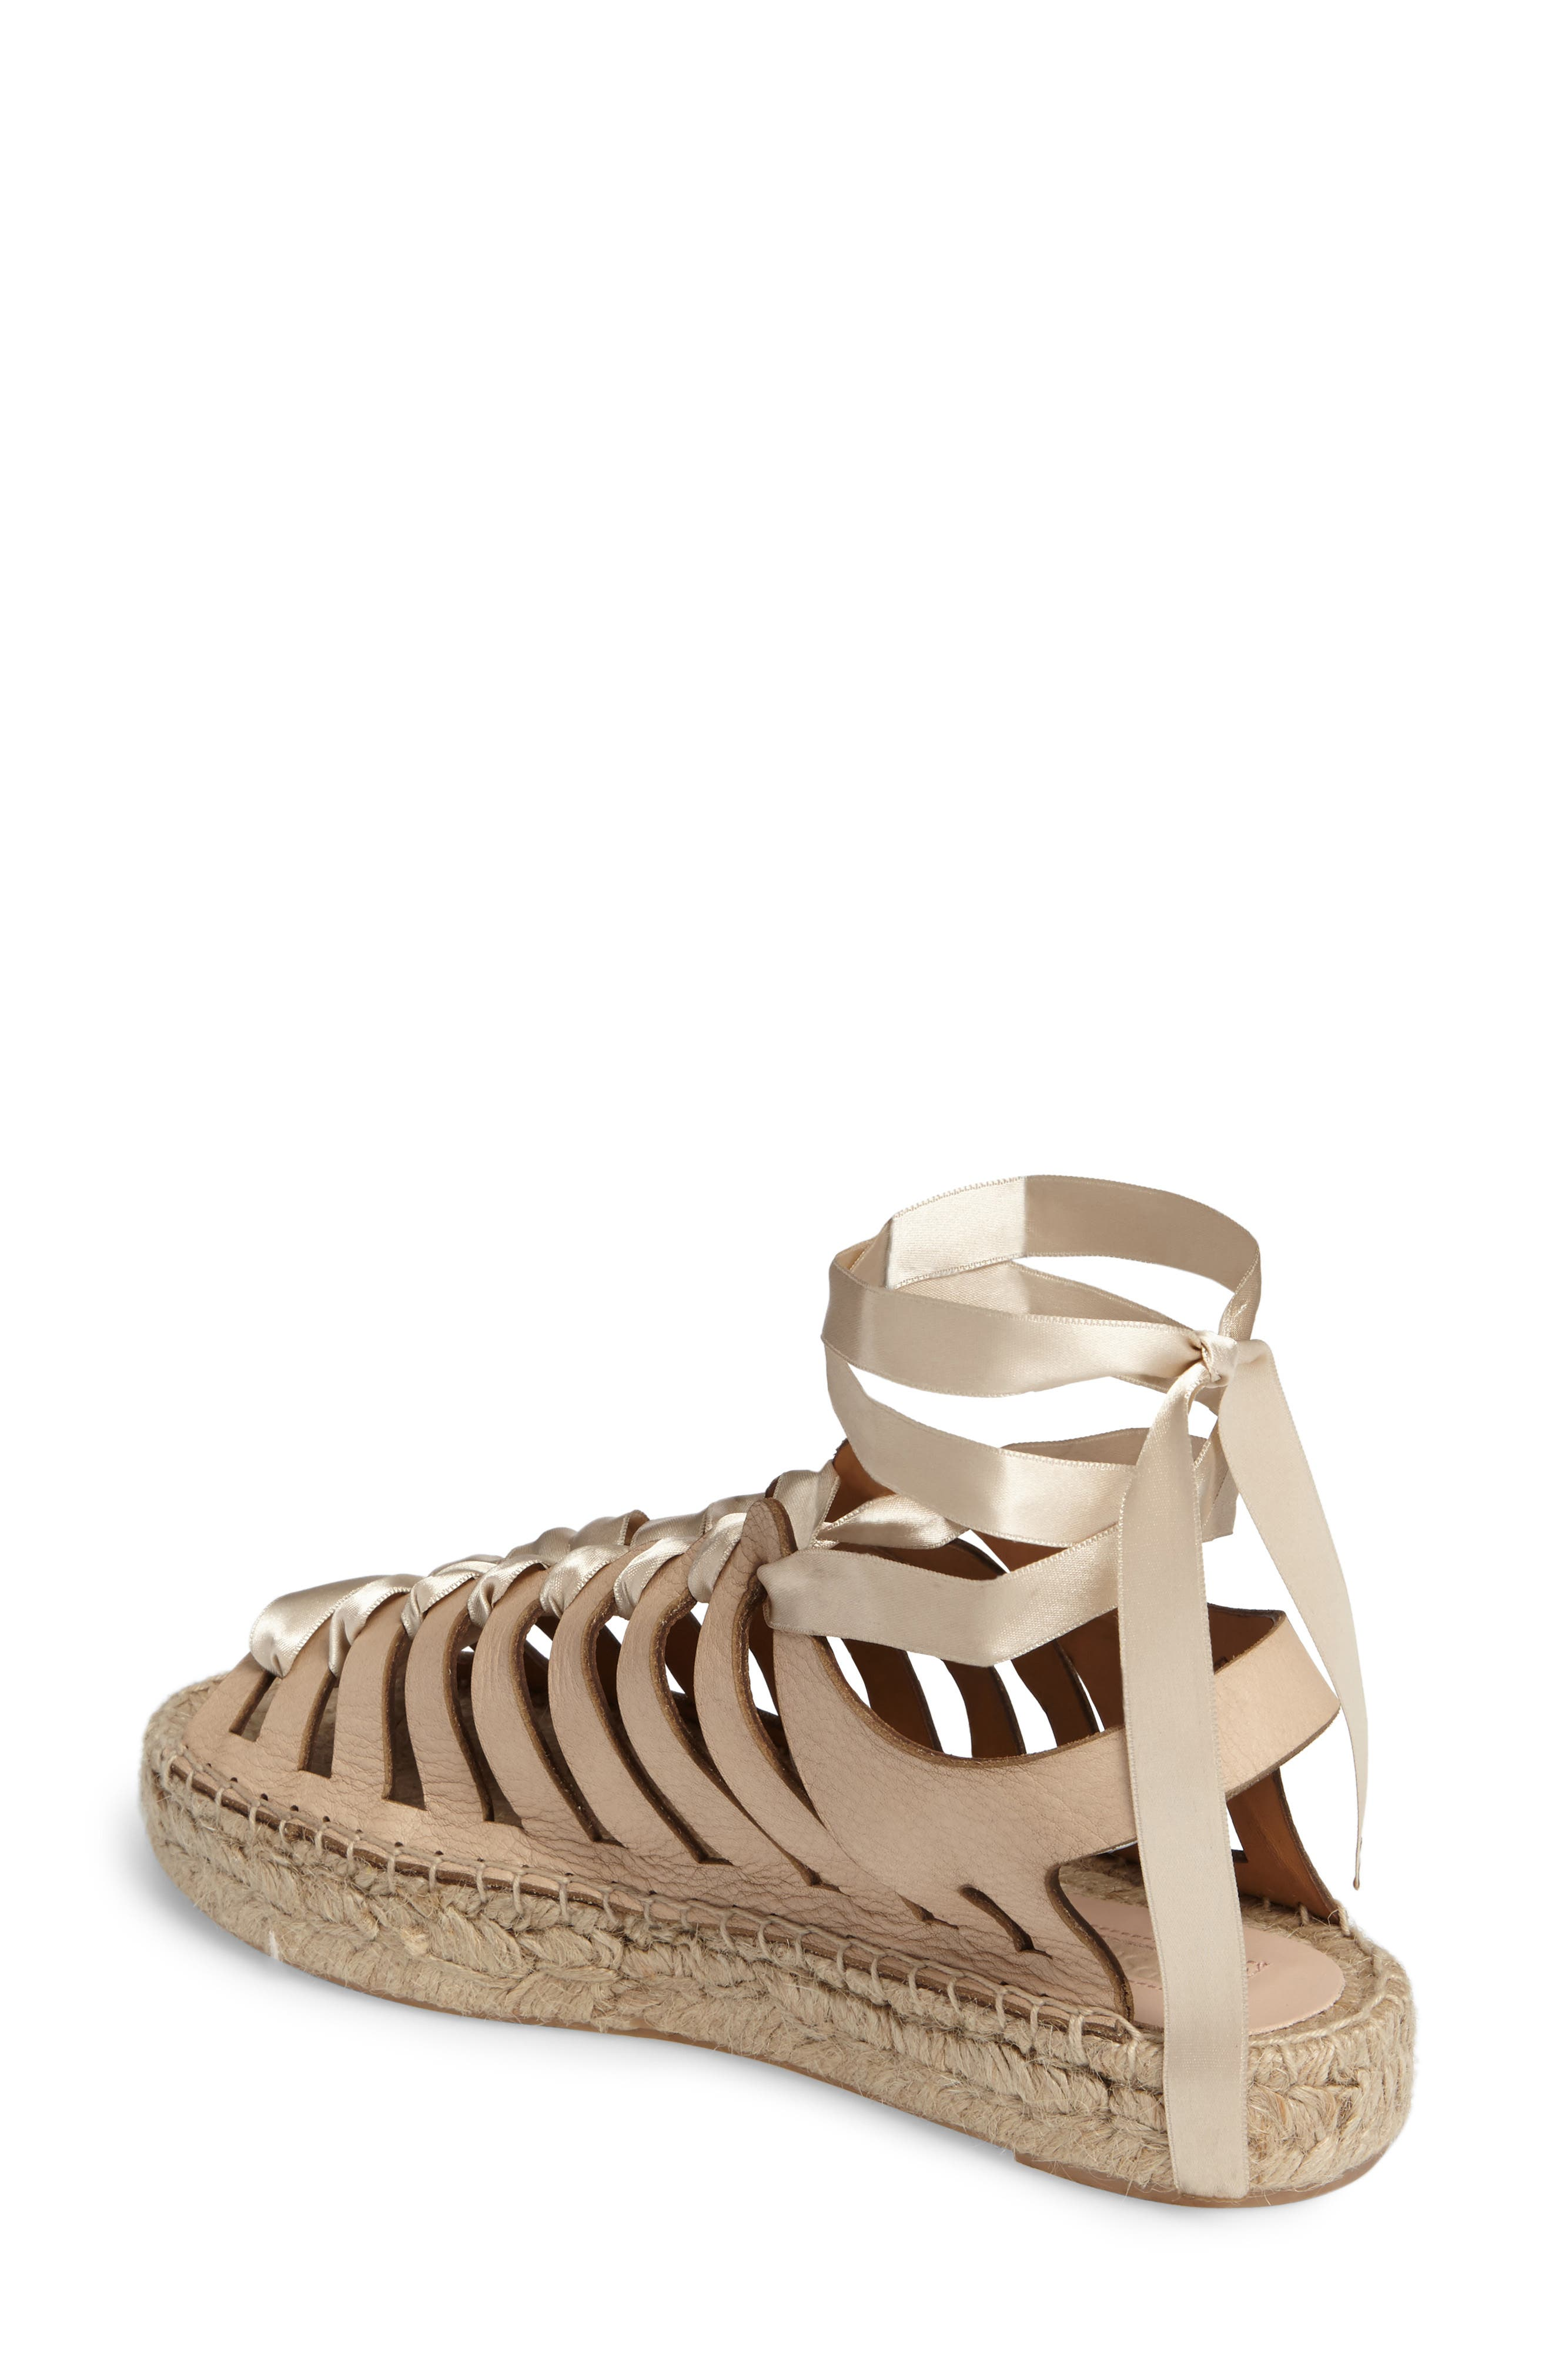 Krown Wraparound Platform Sandal,                             Alternate thumbnail 2, color,                             Nude Leather